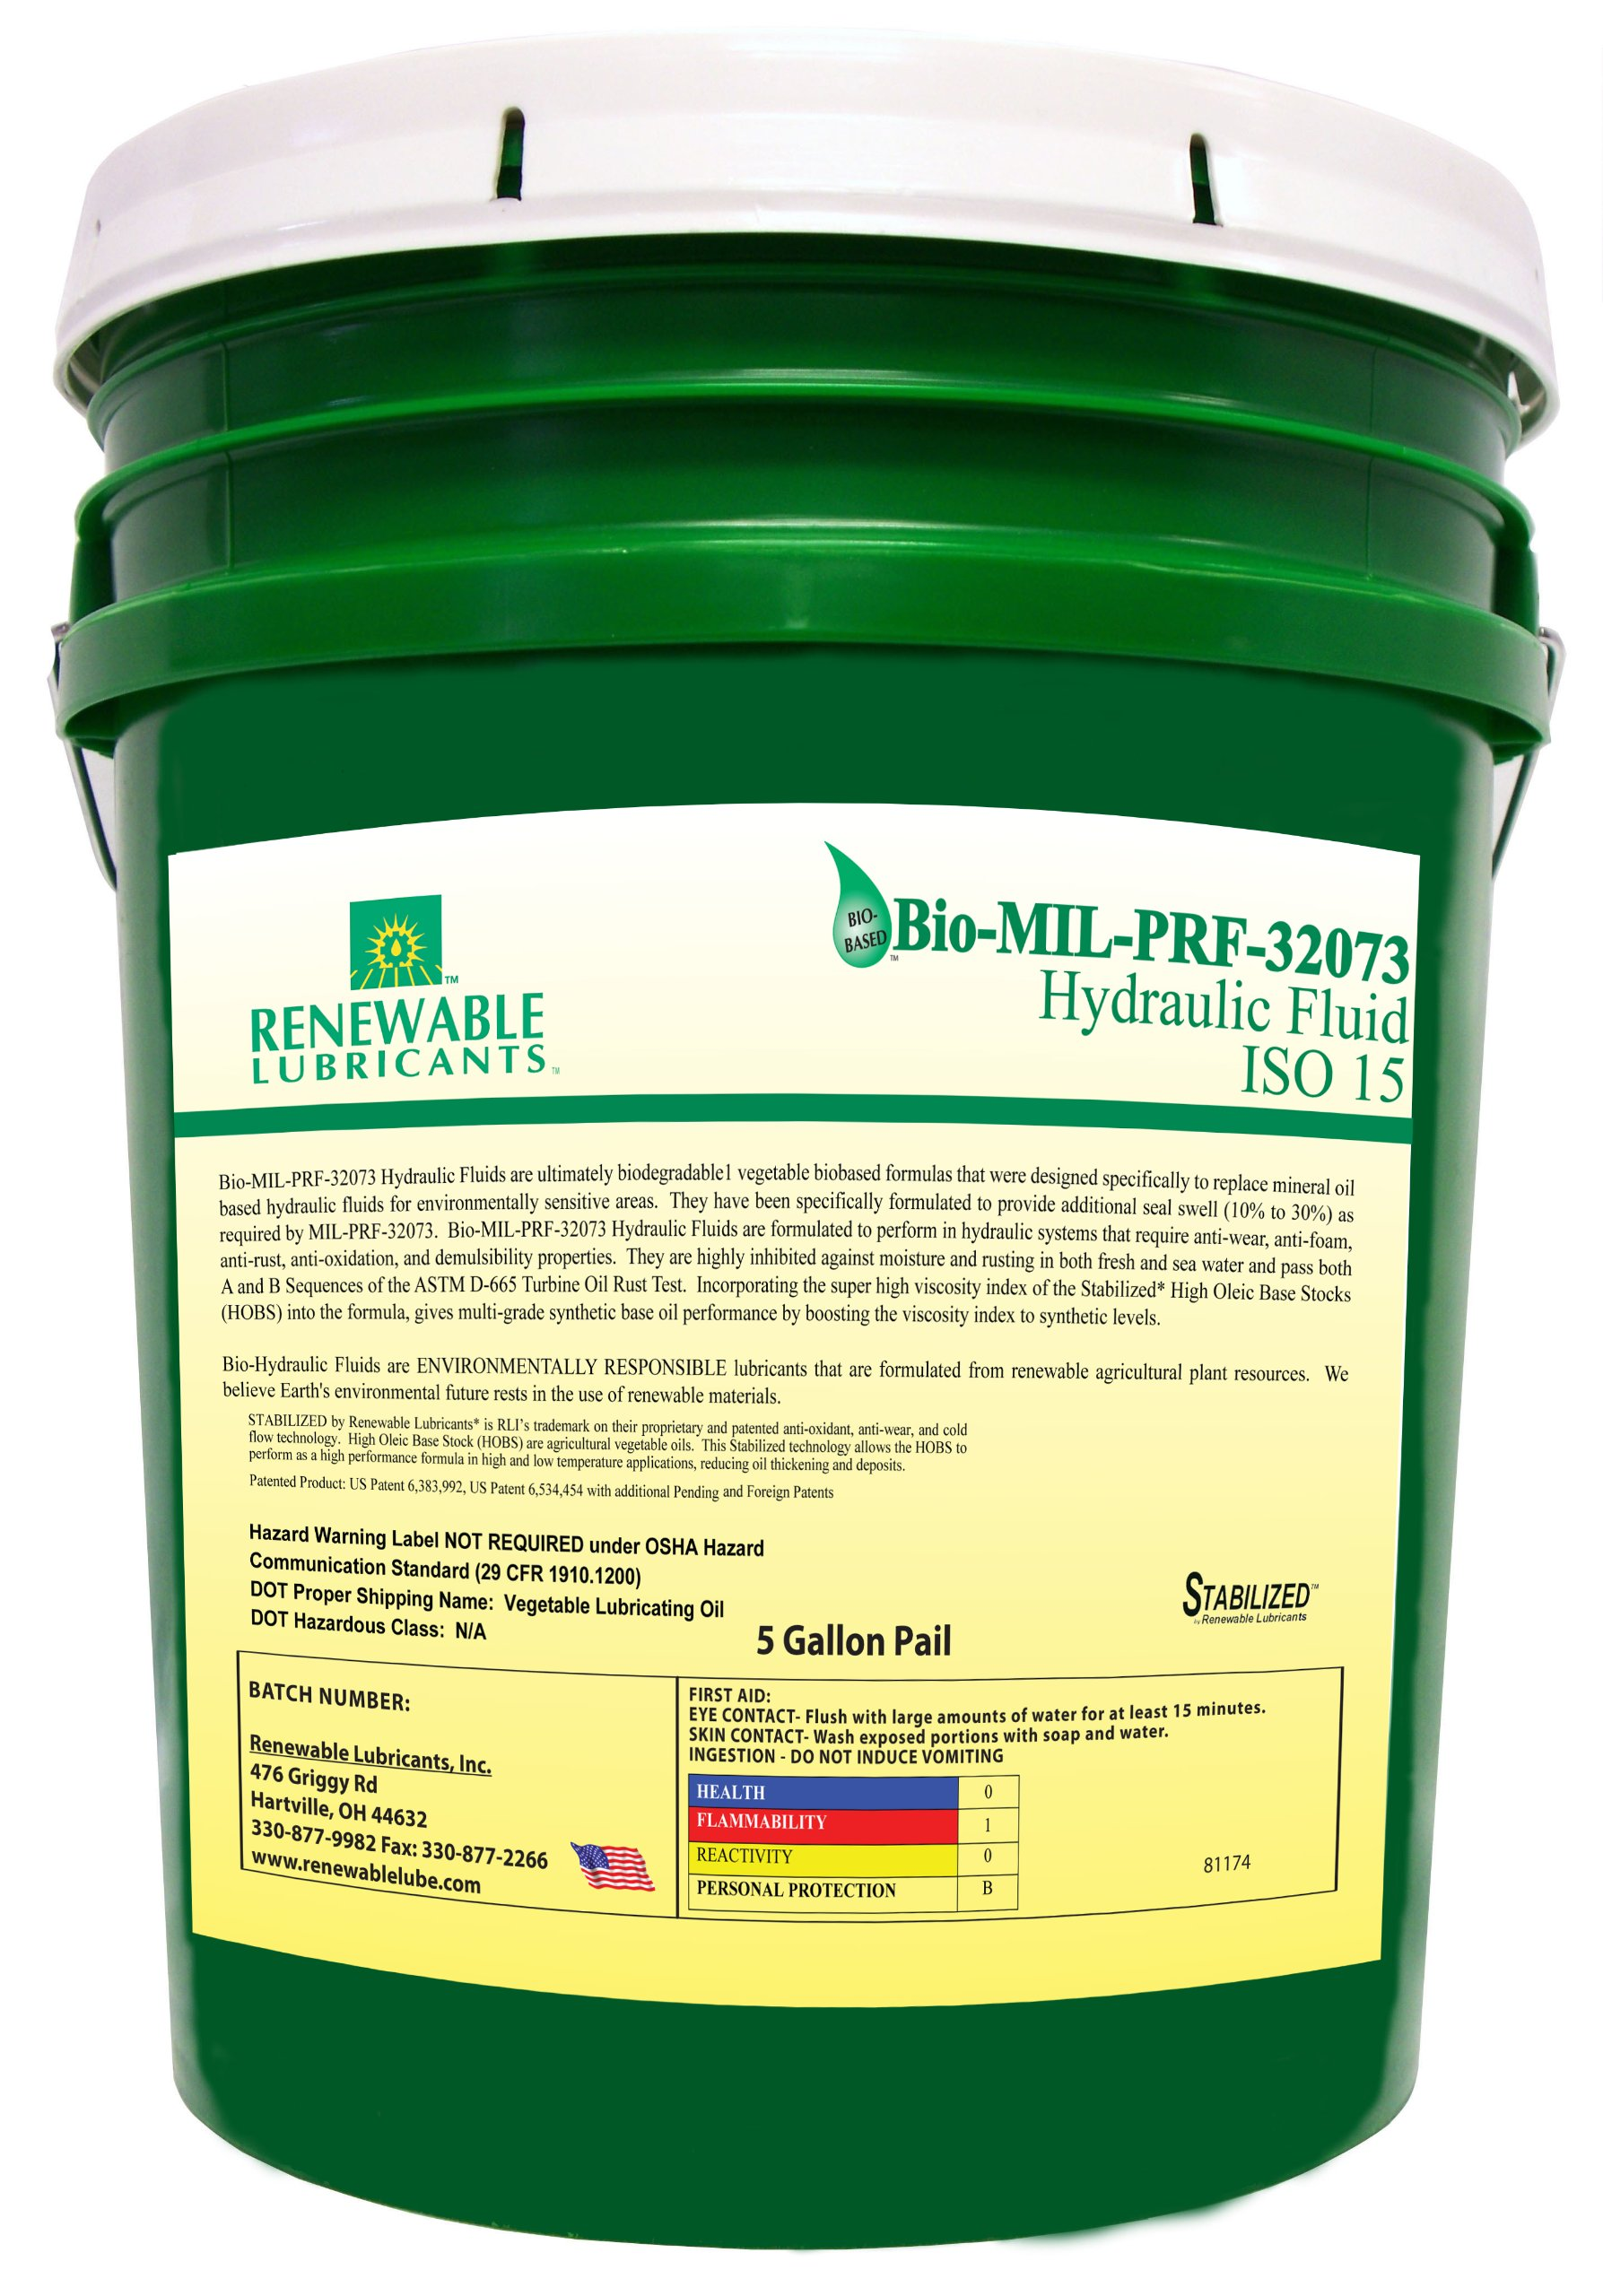 Renewable Lubricants Bio-MIL-PRF-32073 ISO 15 Hydraulic Fluid, 5 Gallon Pail by Renewable Lubricants